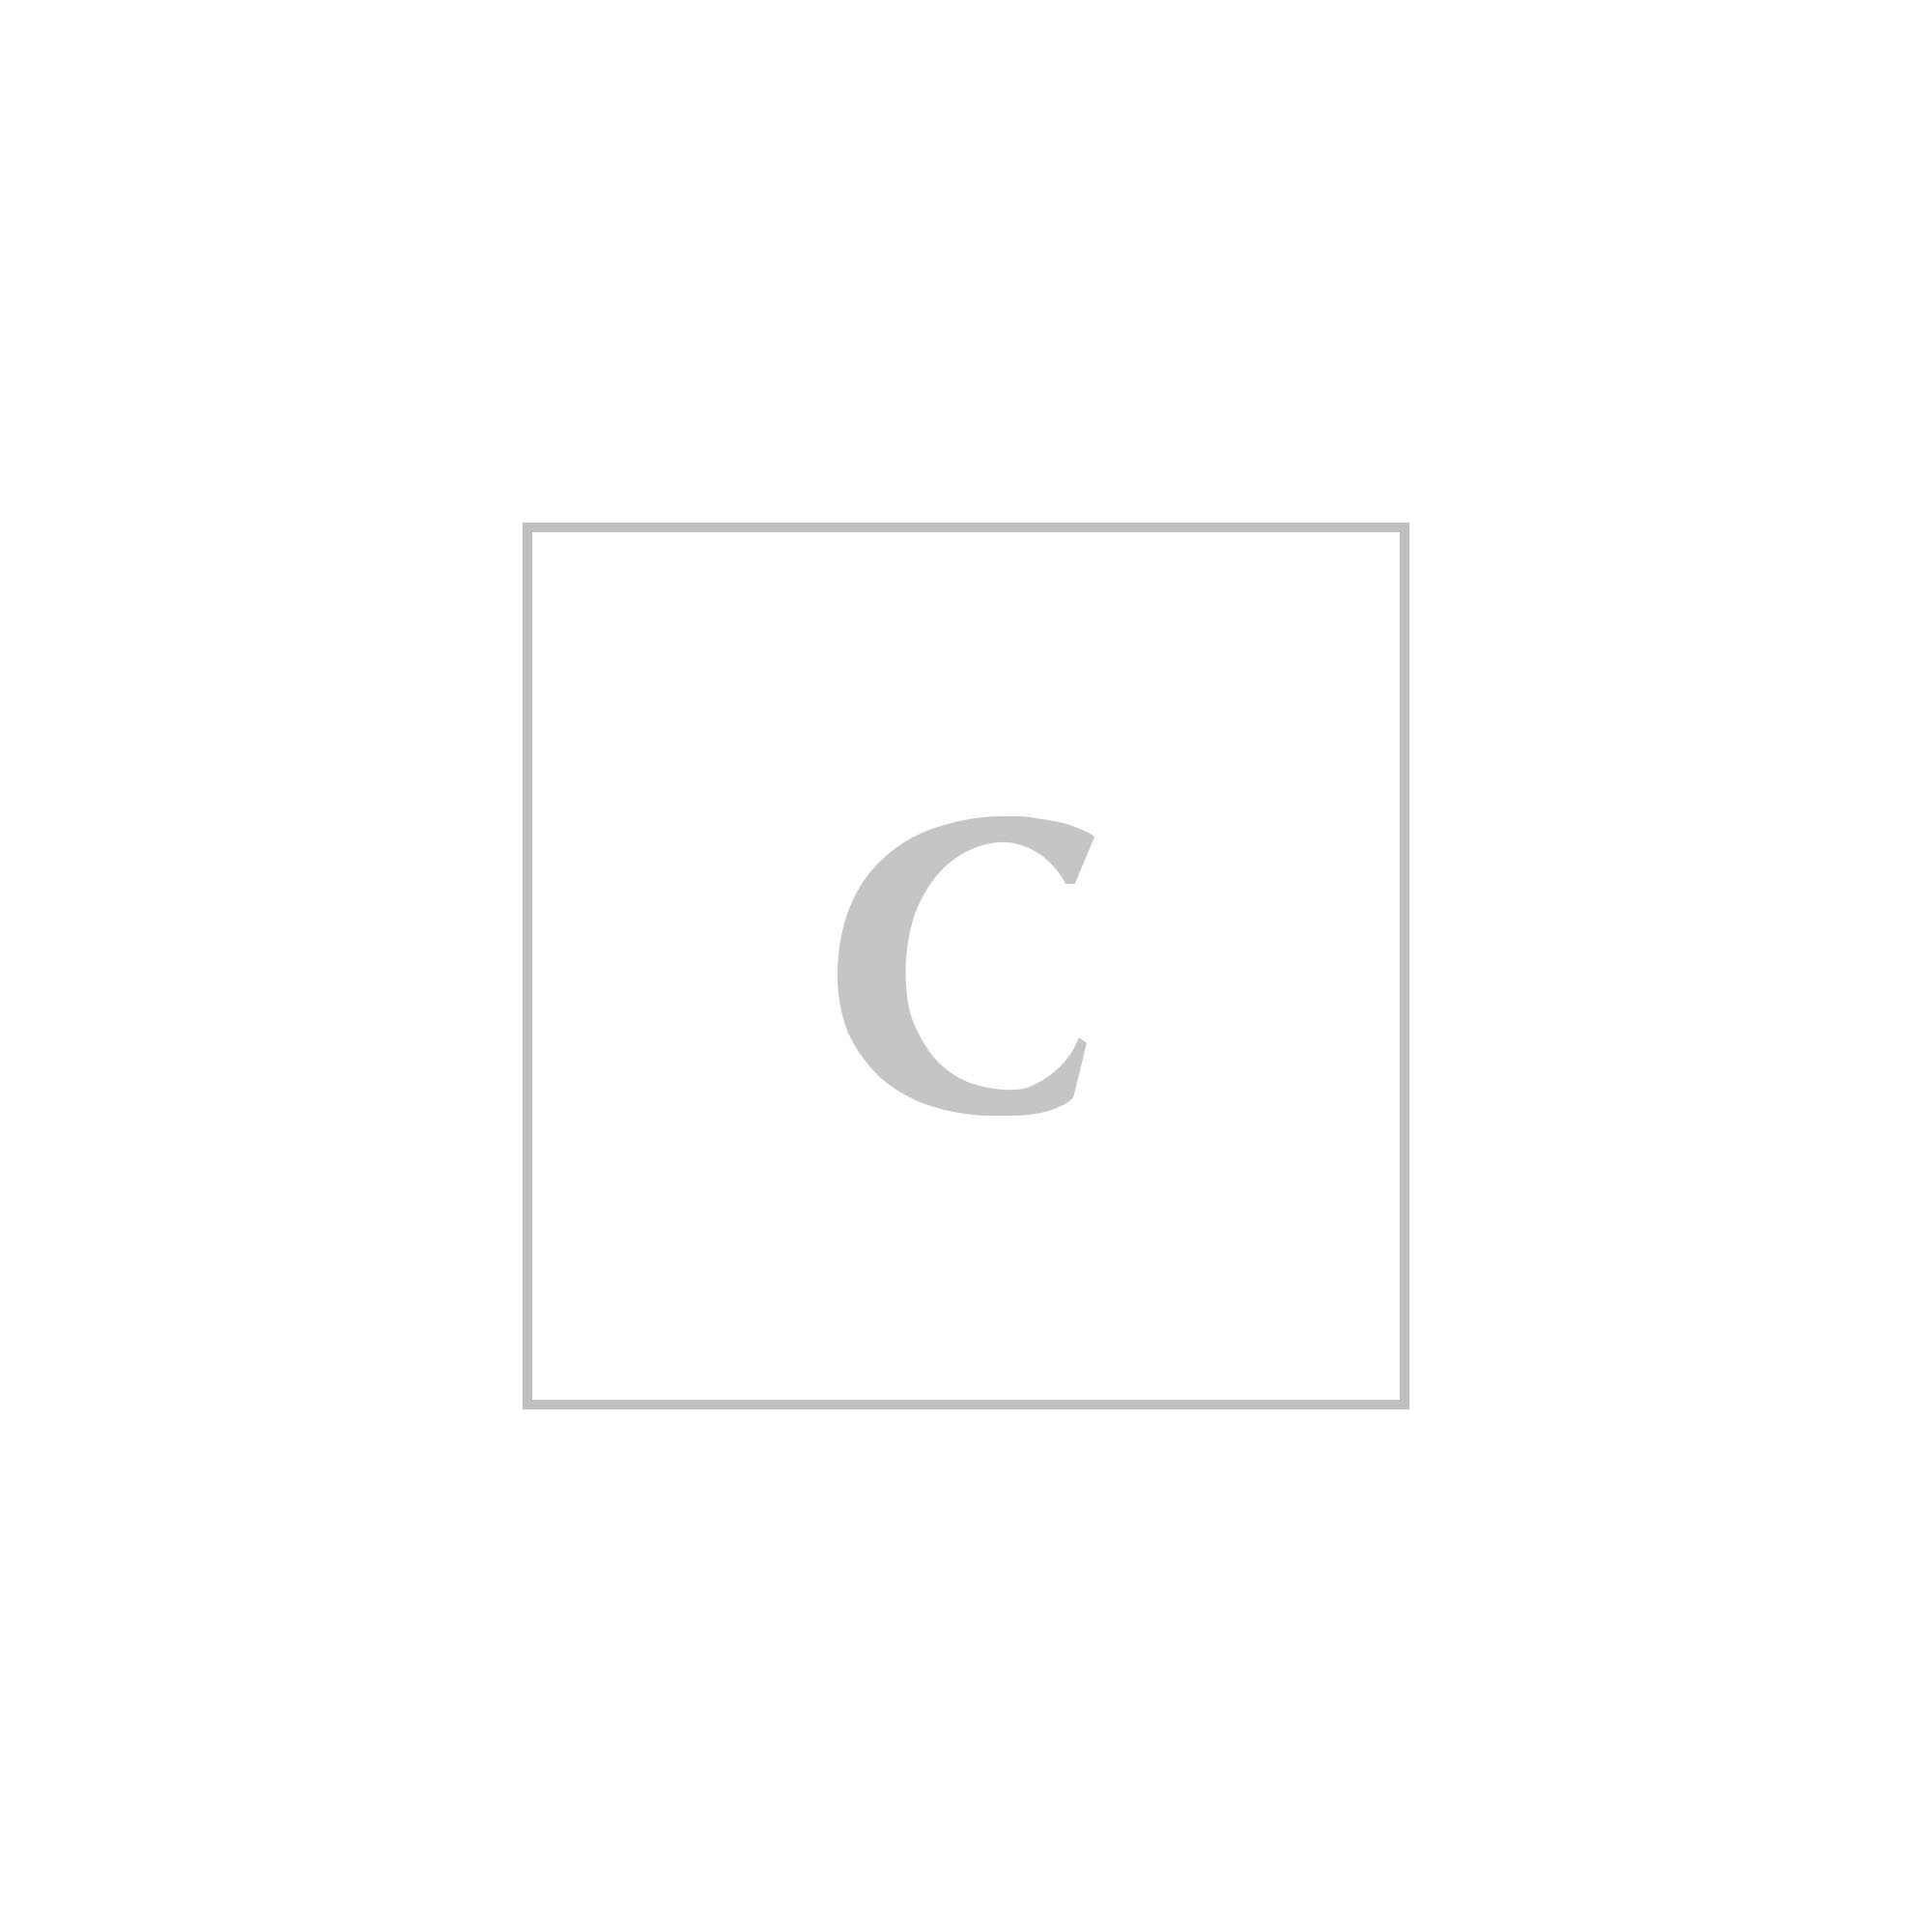 Salvatore ferragamo scarpa 2e nander 028287 009 vitellino arizona s